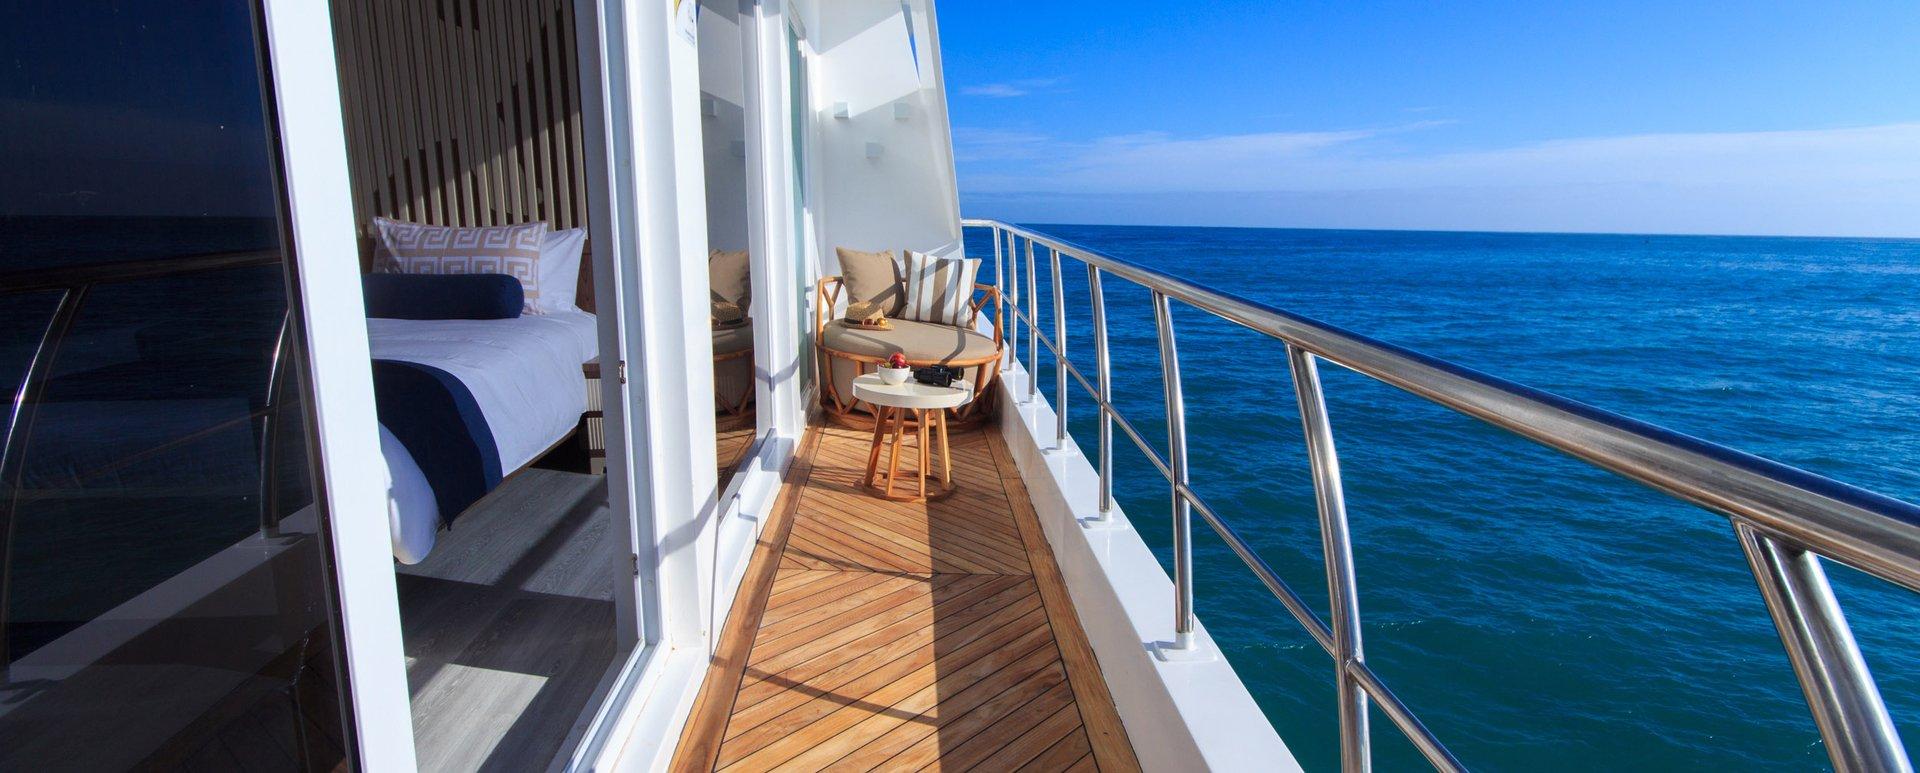 Galapagos Elite Catamaran balcony